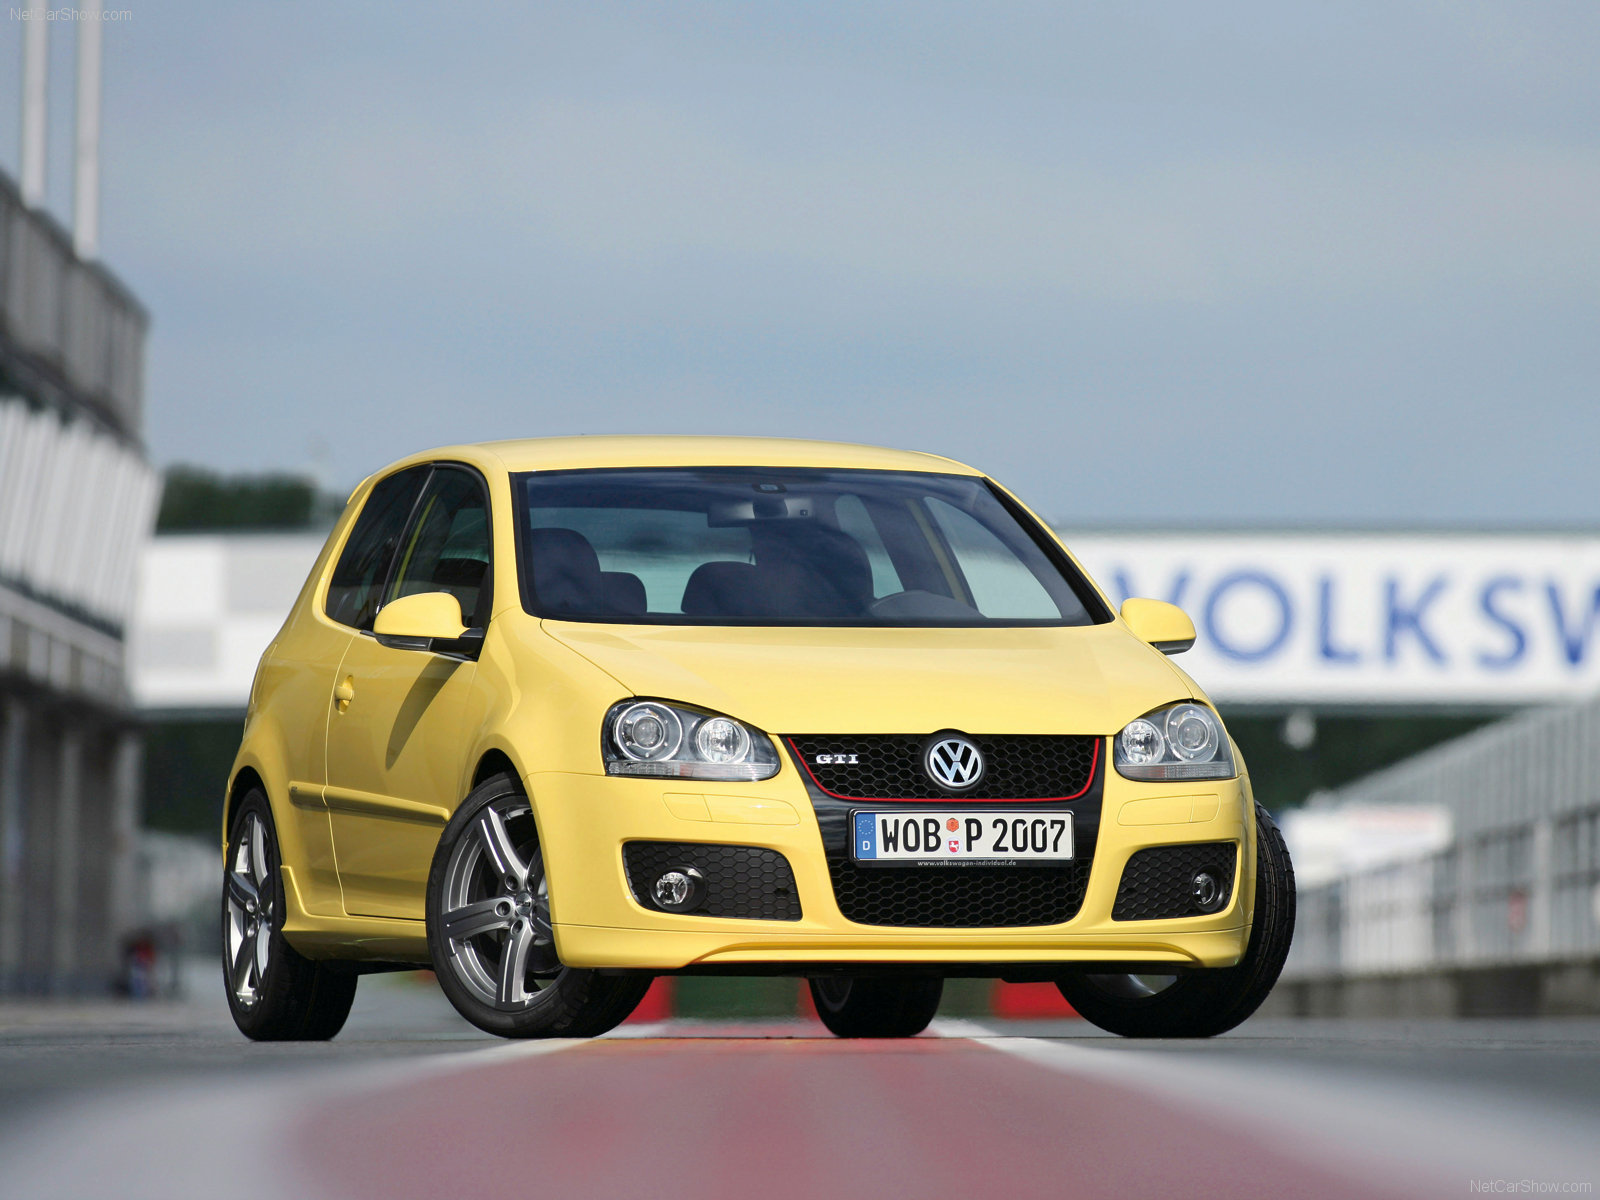 http://2.bp.blogspot.com/-1tvtyPJPZRA/Tt0zFiErWgI/AAAAAAAAAok/6cZZ_xAVsVY/s1600/Volkswagen-Golf_GTI_Pirelli_2007_1600x1200_wallpaper_01.jpg